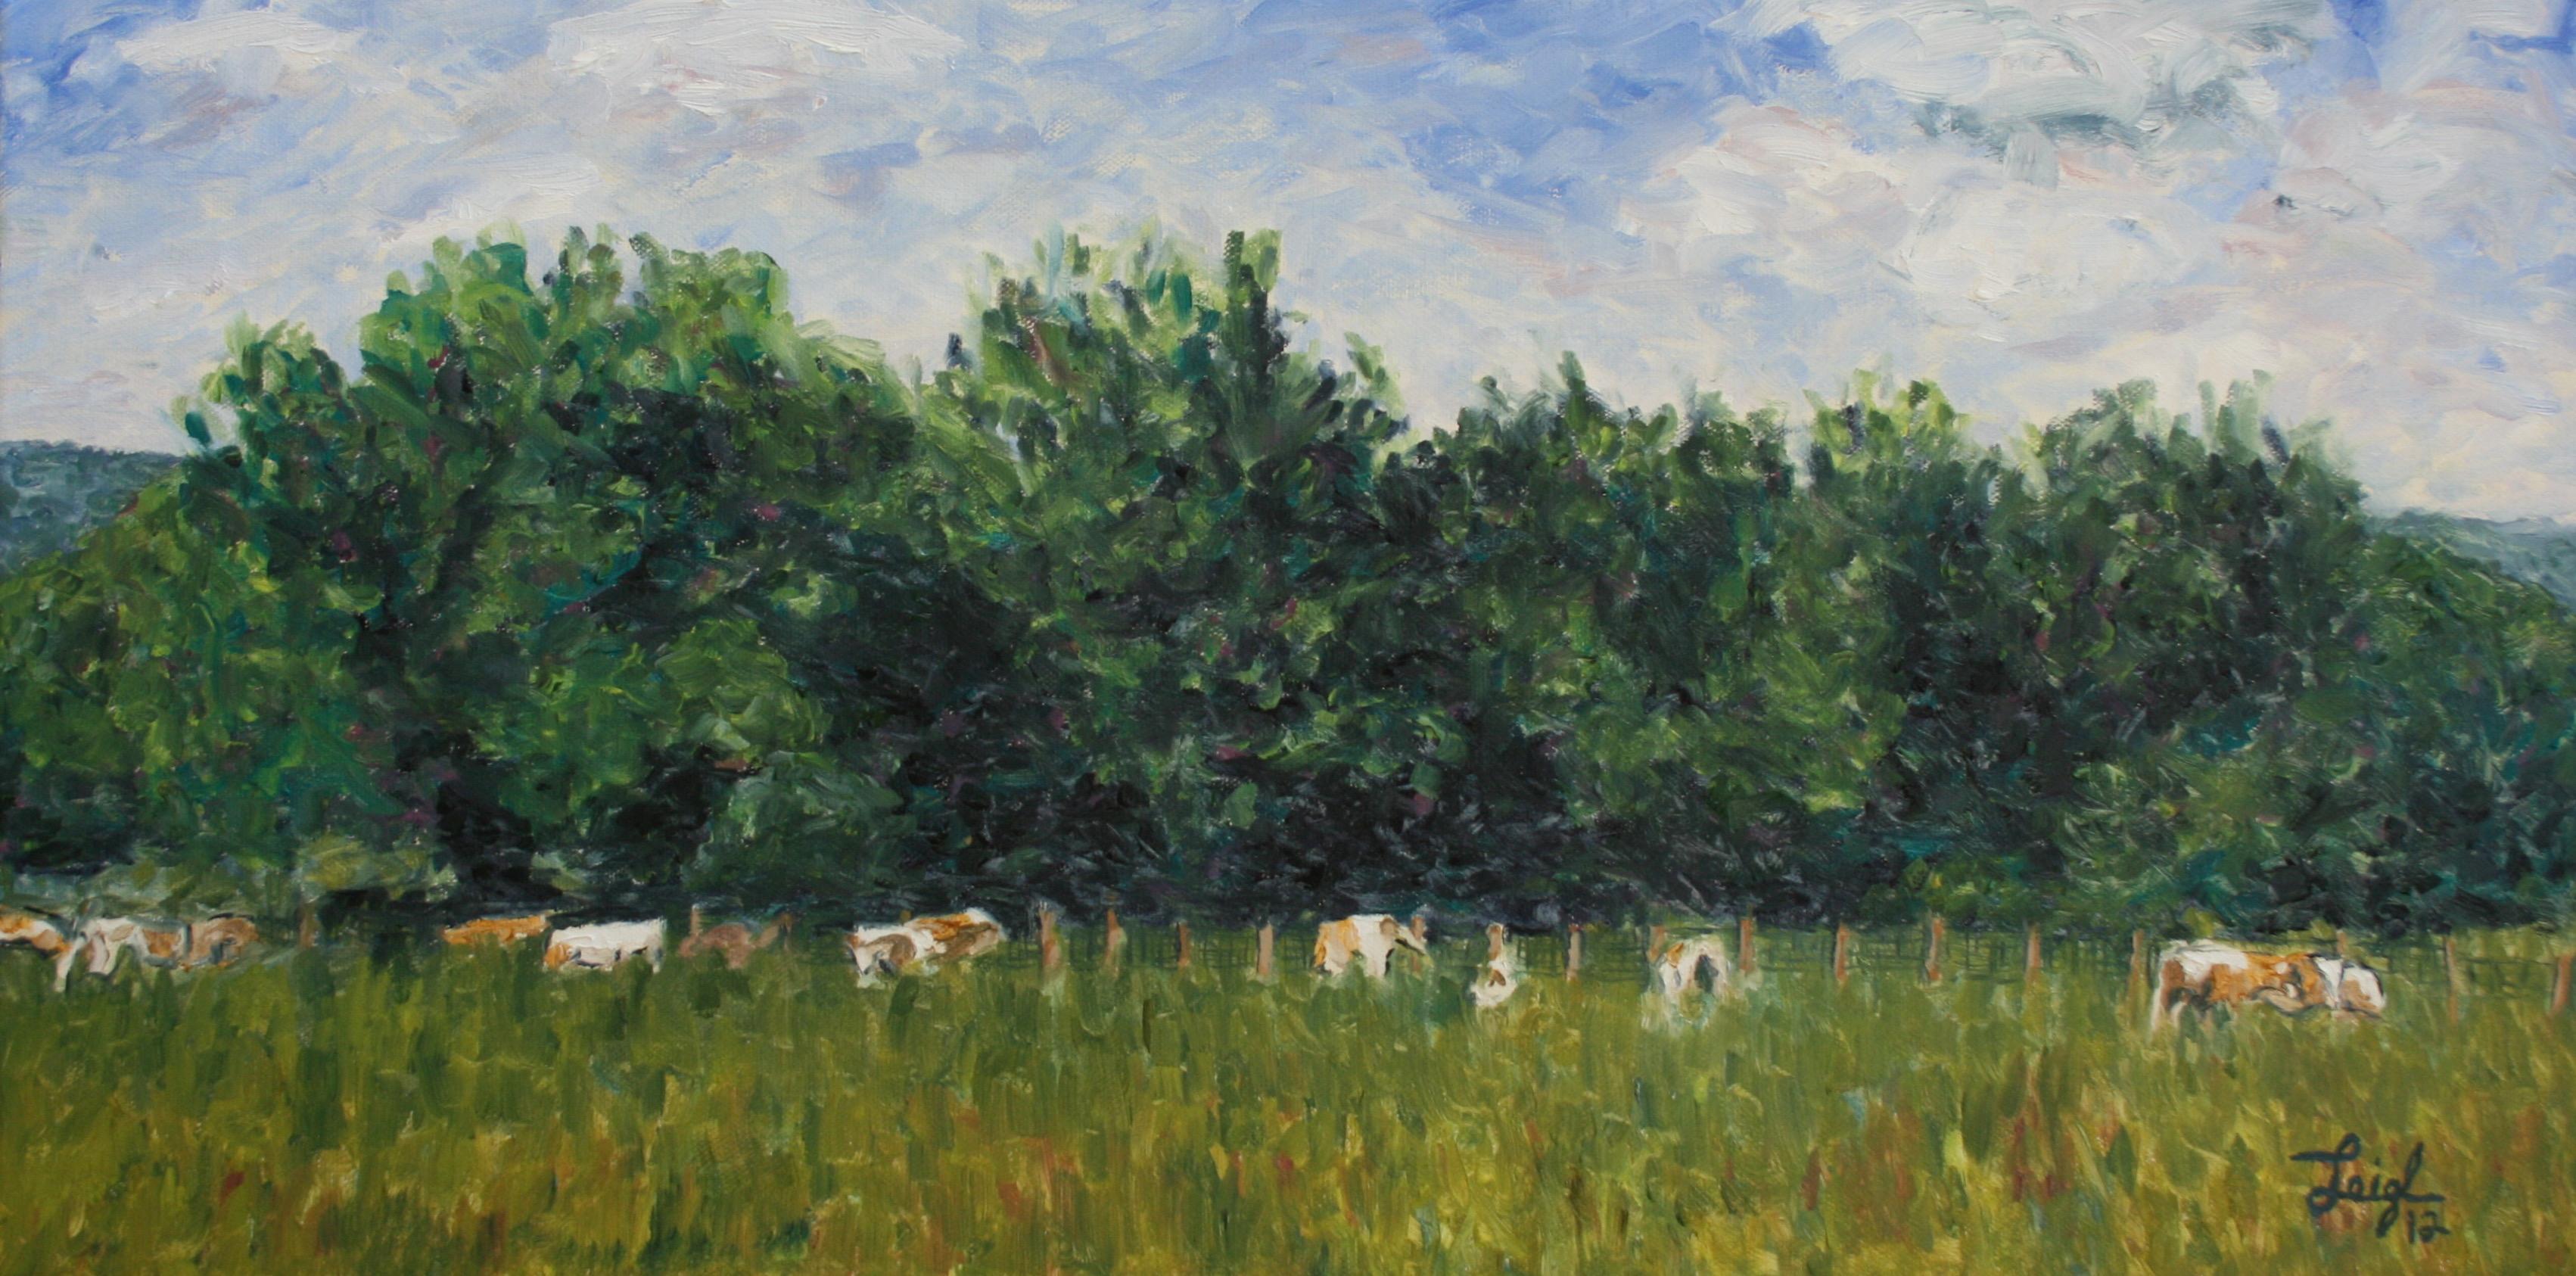 Cows at Argenteuil  ~   Cynthia Copeland & Greg Spiegal. Pasadena, CA 2012 • 24 x 12